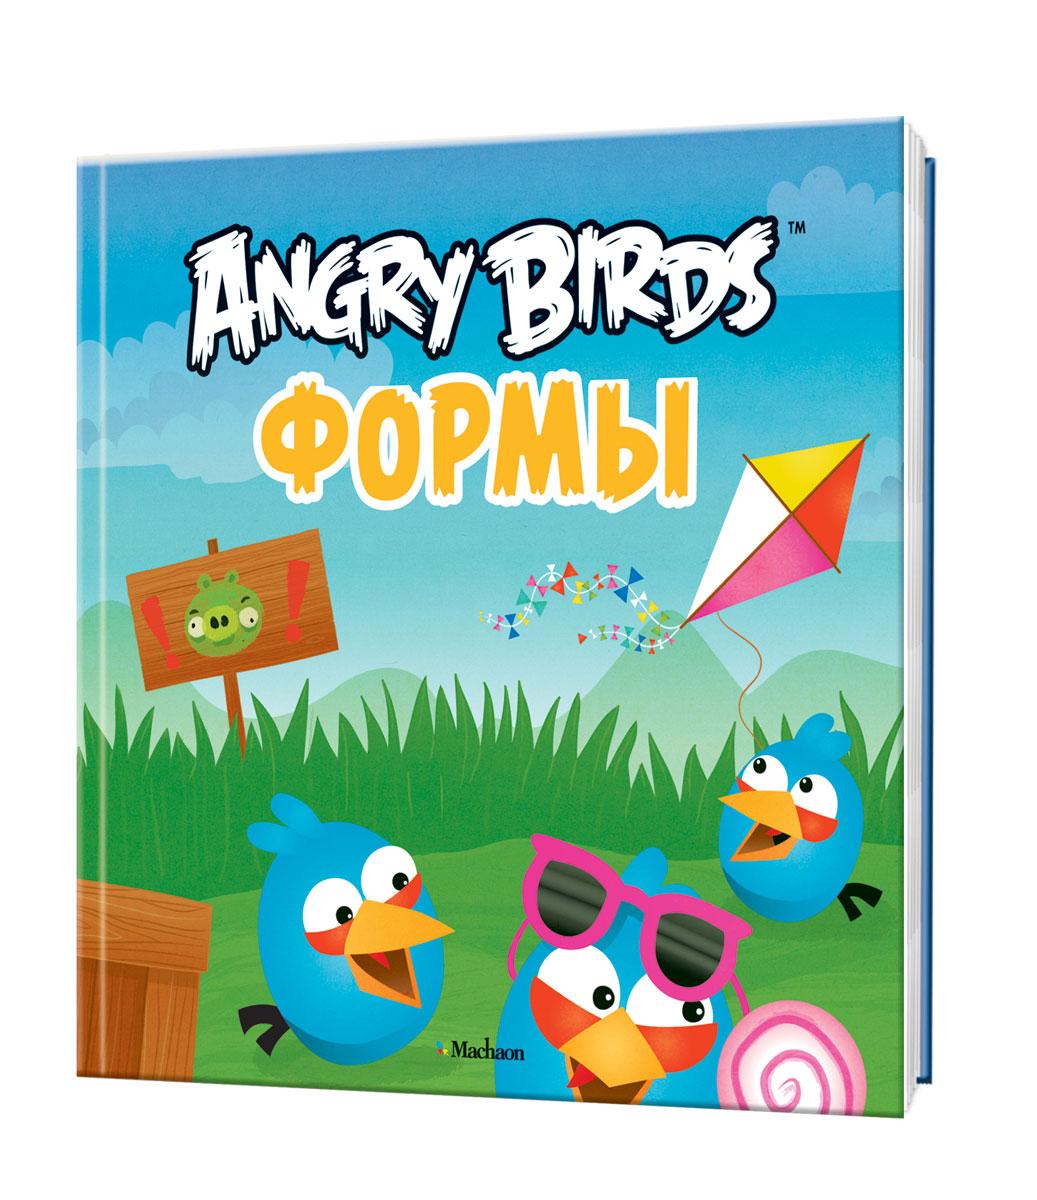 Angry Birds. Формы